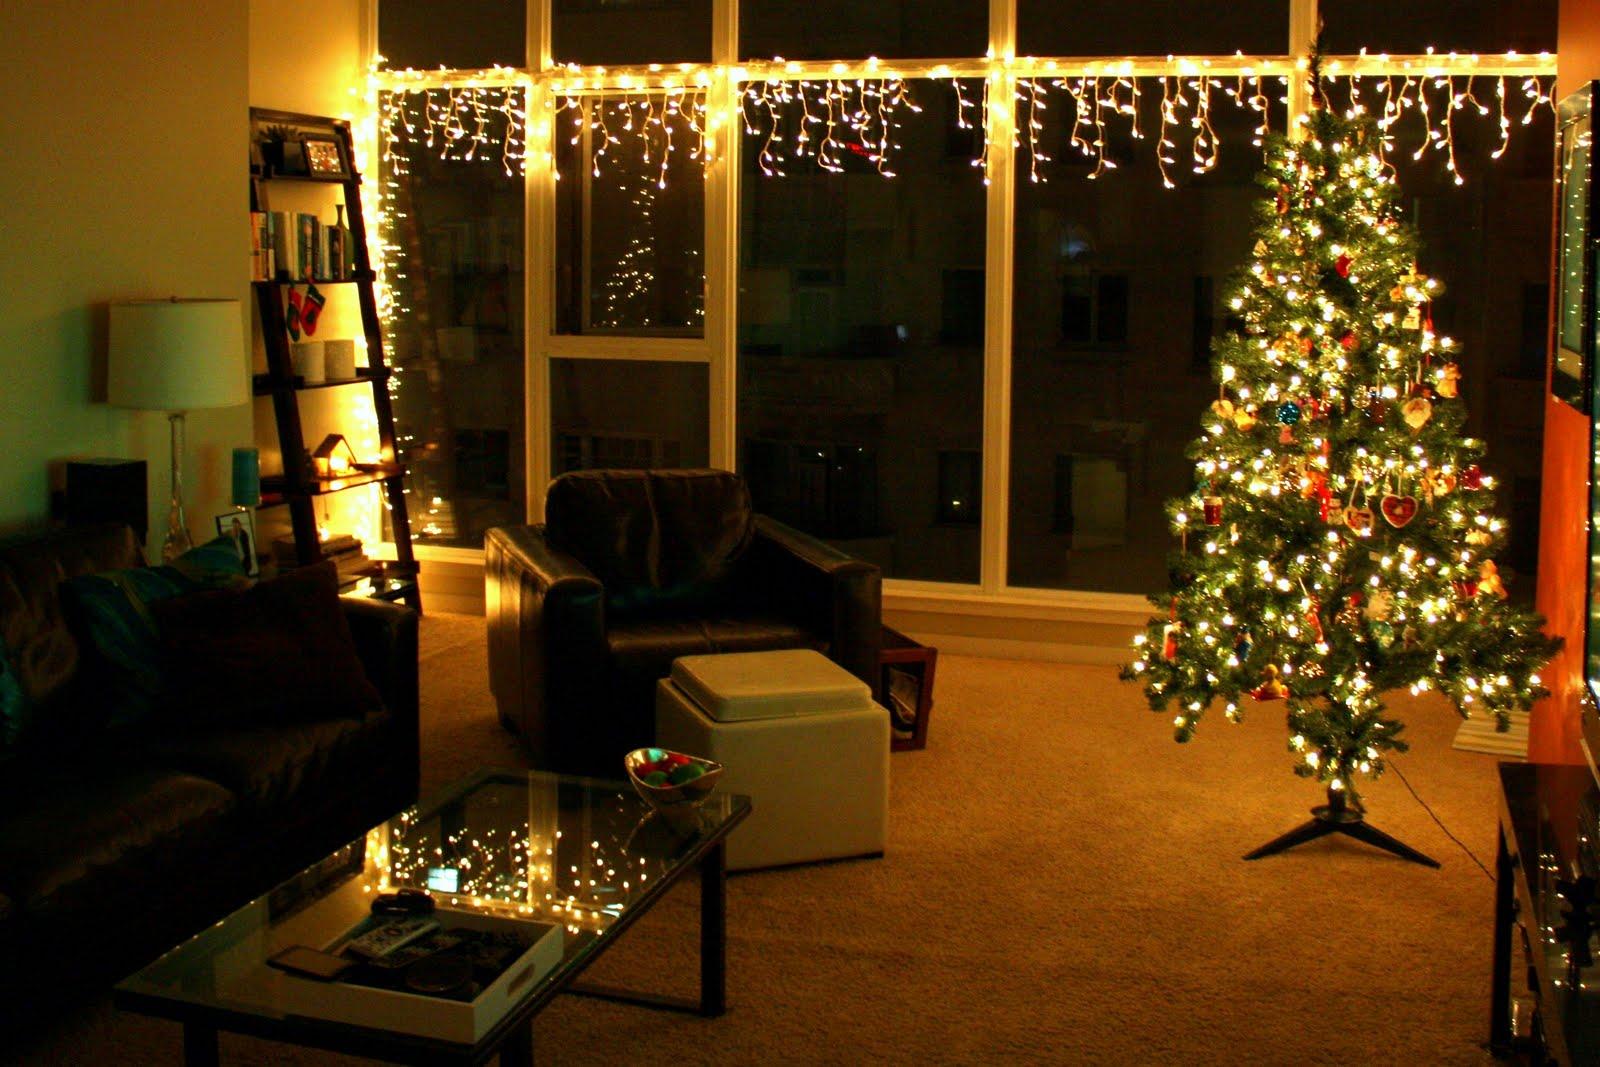 Newlyweds next door rockin 39 around the christmas tree - Christmas tree in living room ...